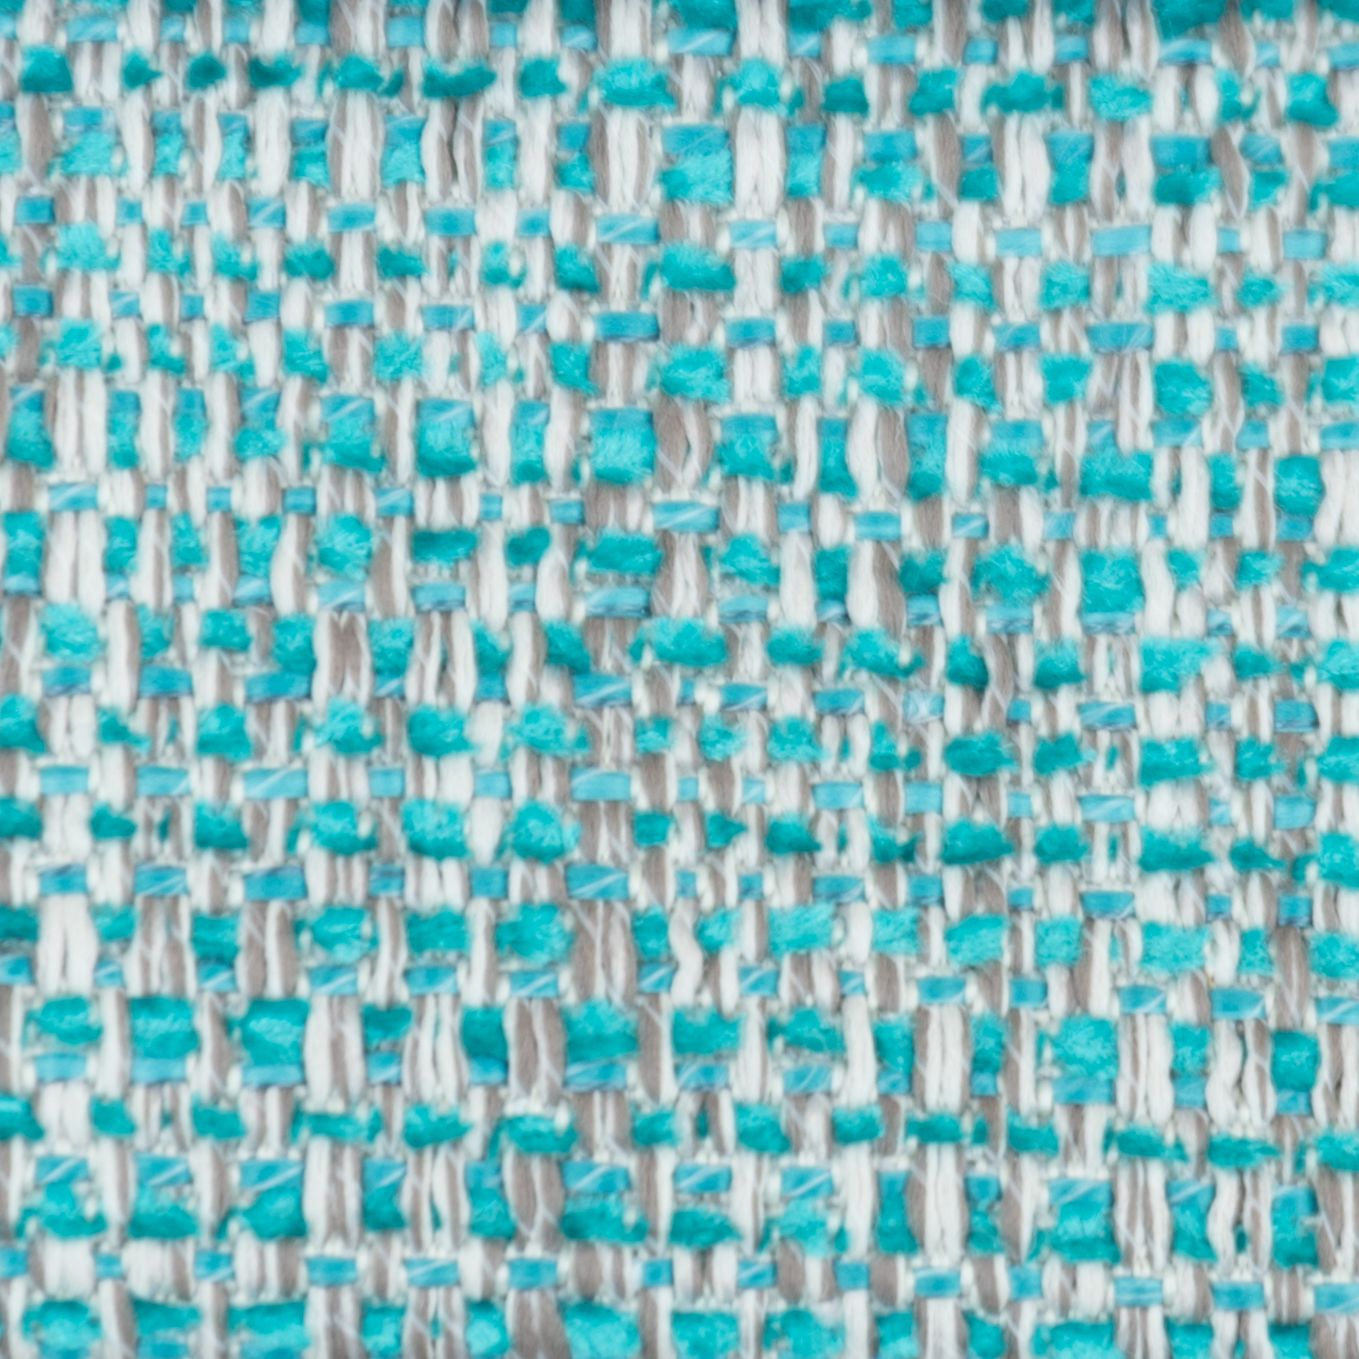 Aquaclean Poeme Turquoise